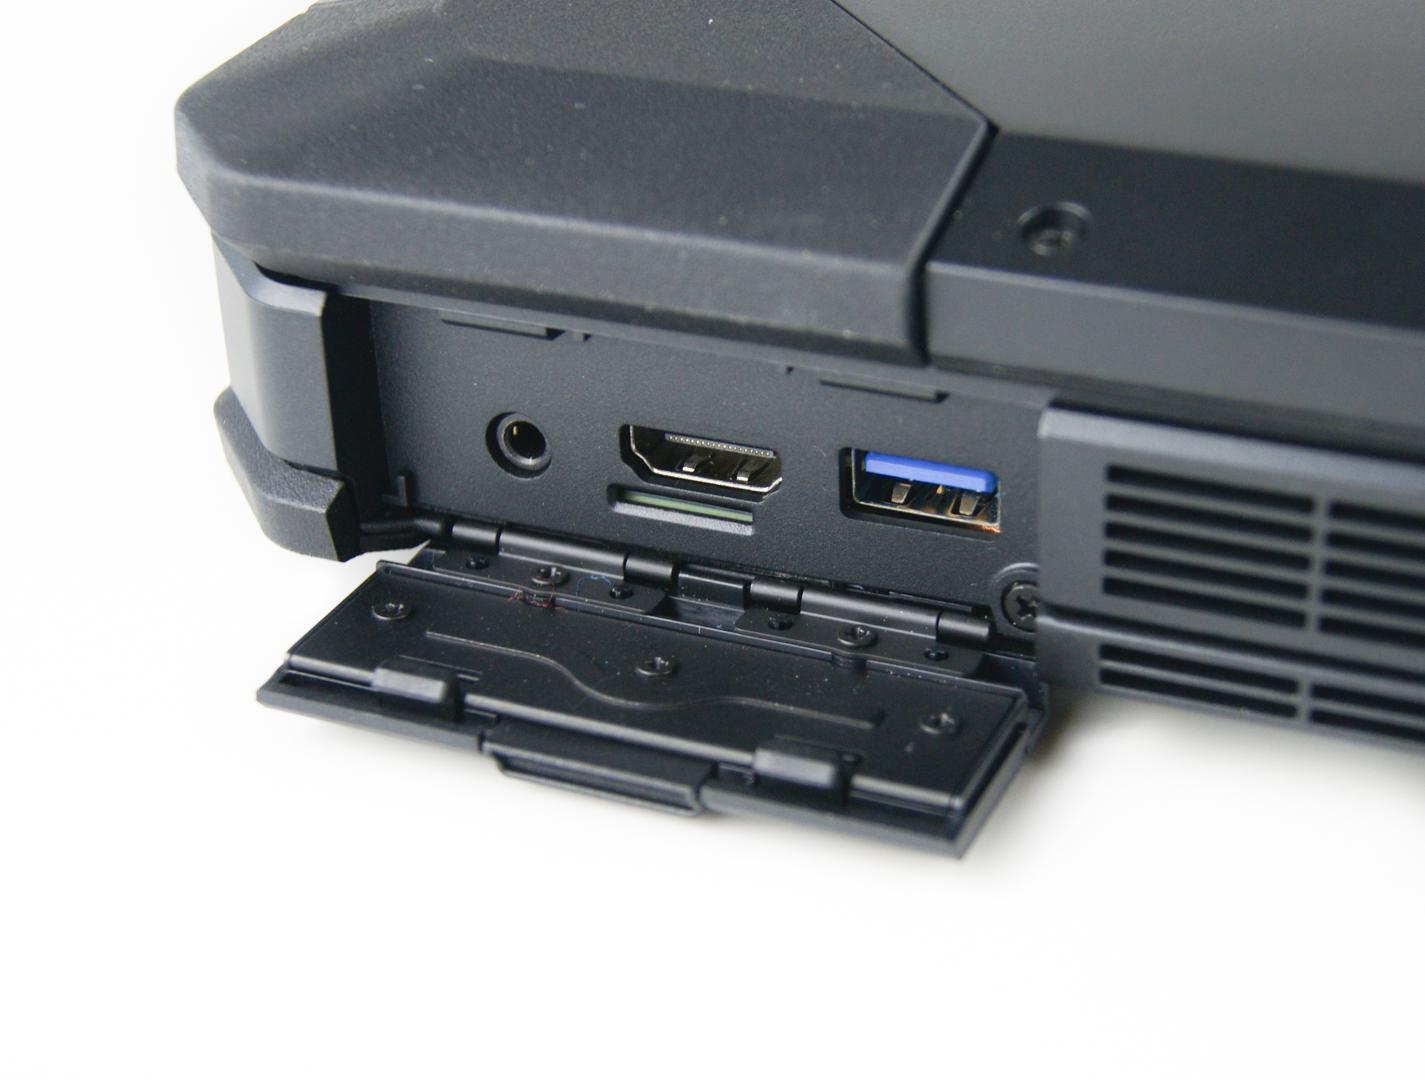 Courte Critique Du Pc Portable Dell Latitude 14 Rugged